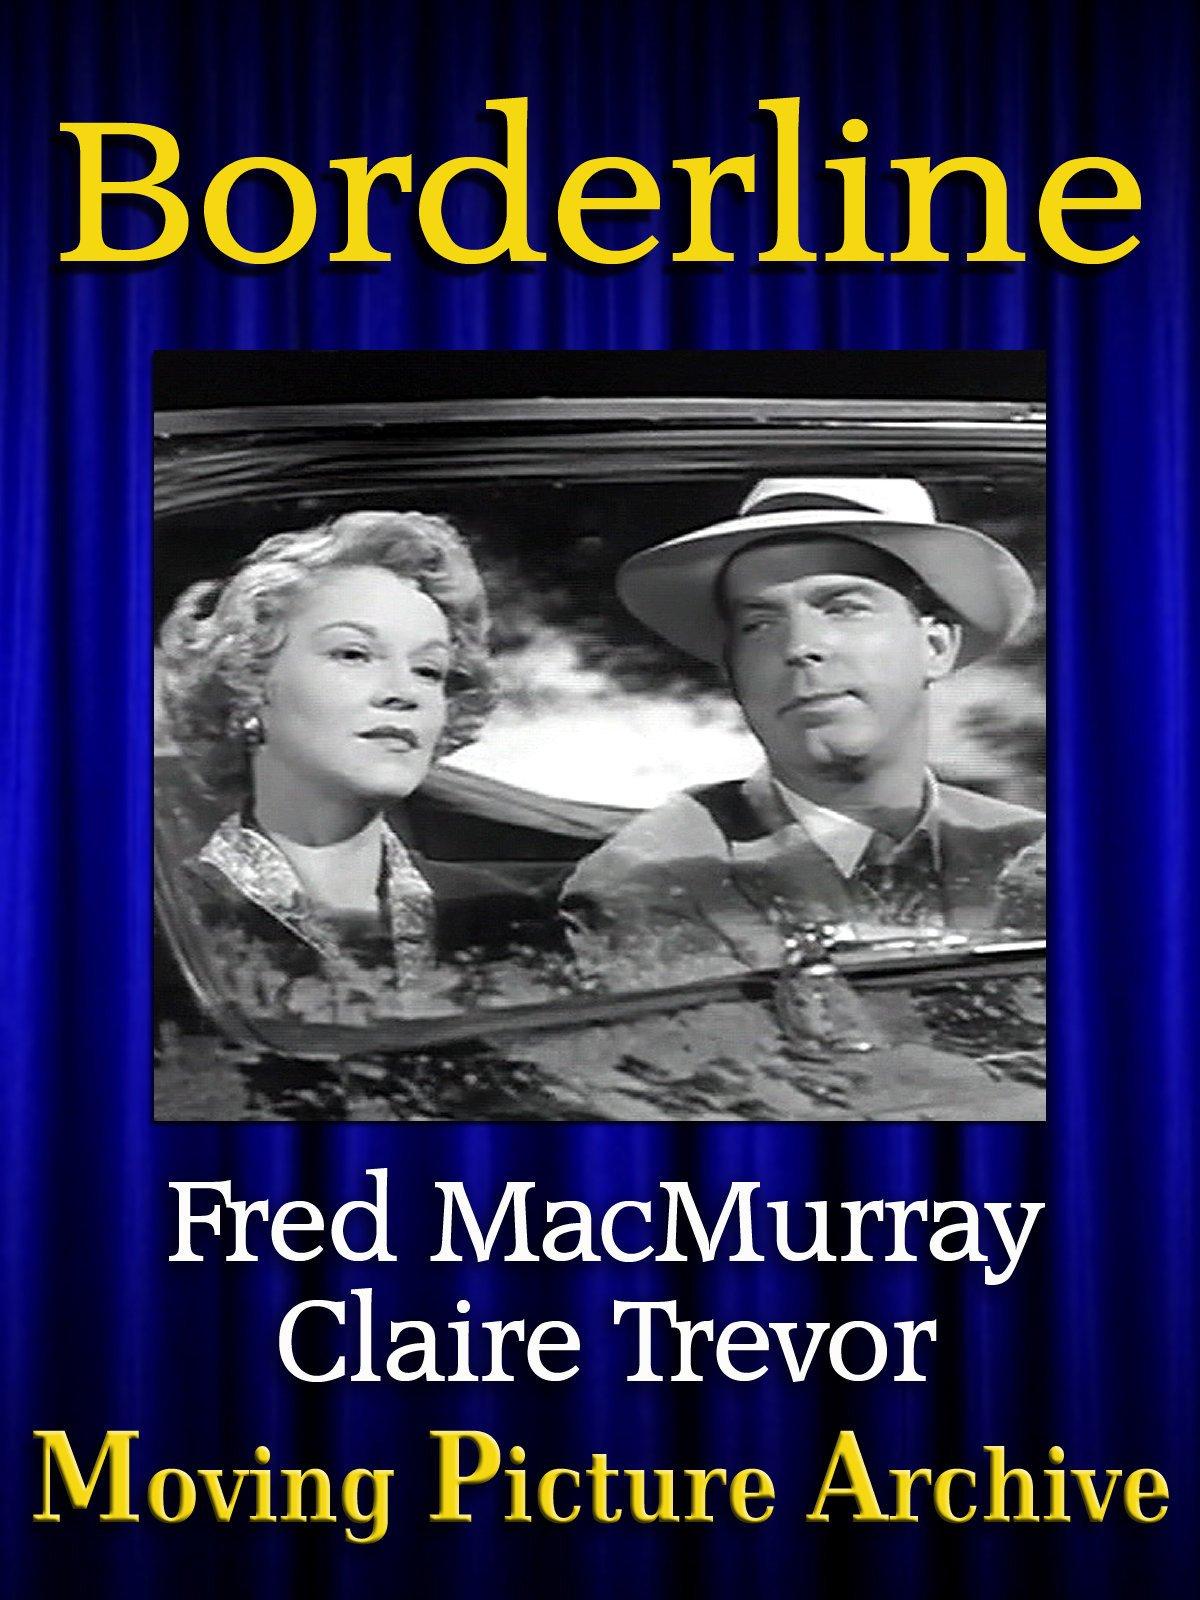 Borderline - 1950 on Amazon Prime Video UK